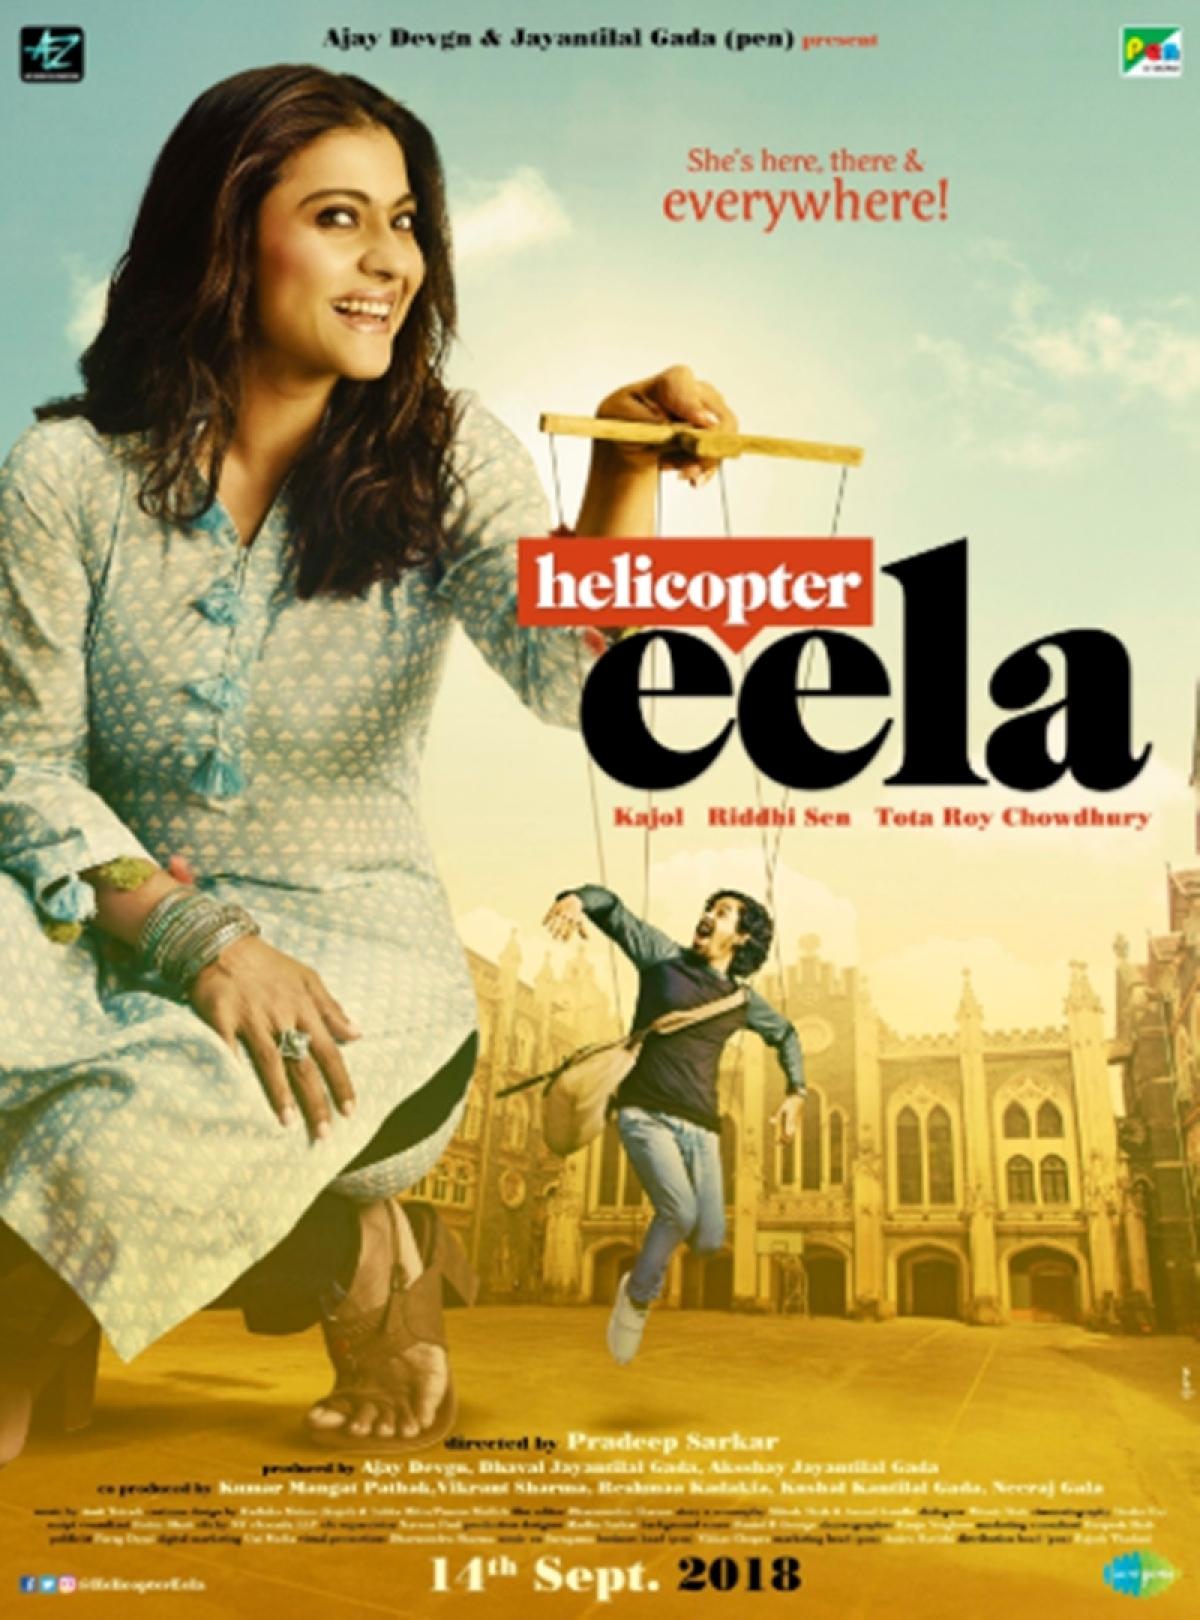 Kajol unveils new poster of Pradeep Sarkar's 'Helicopter Eela'